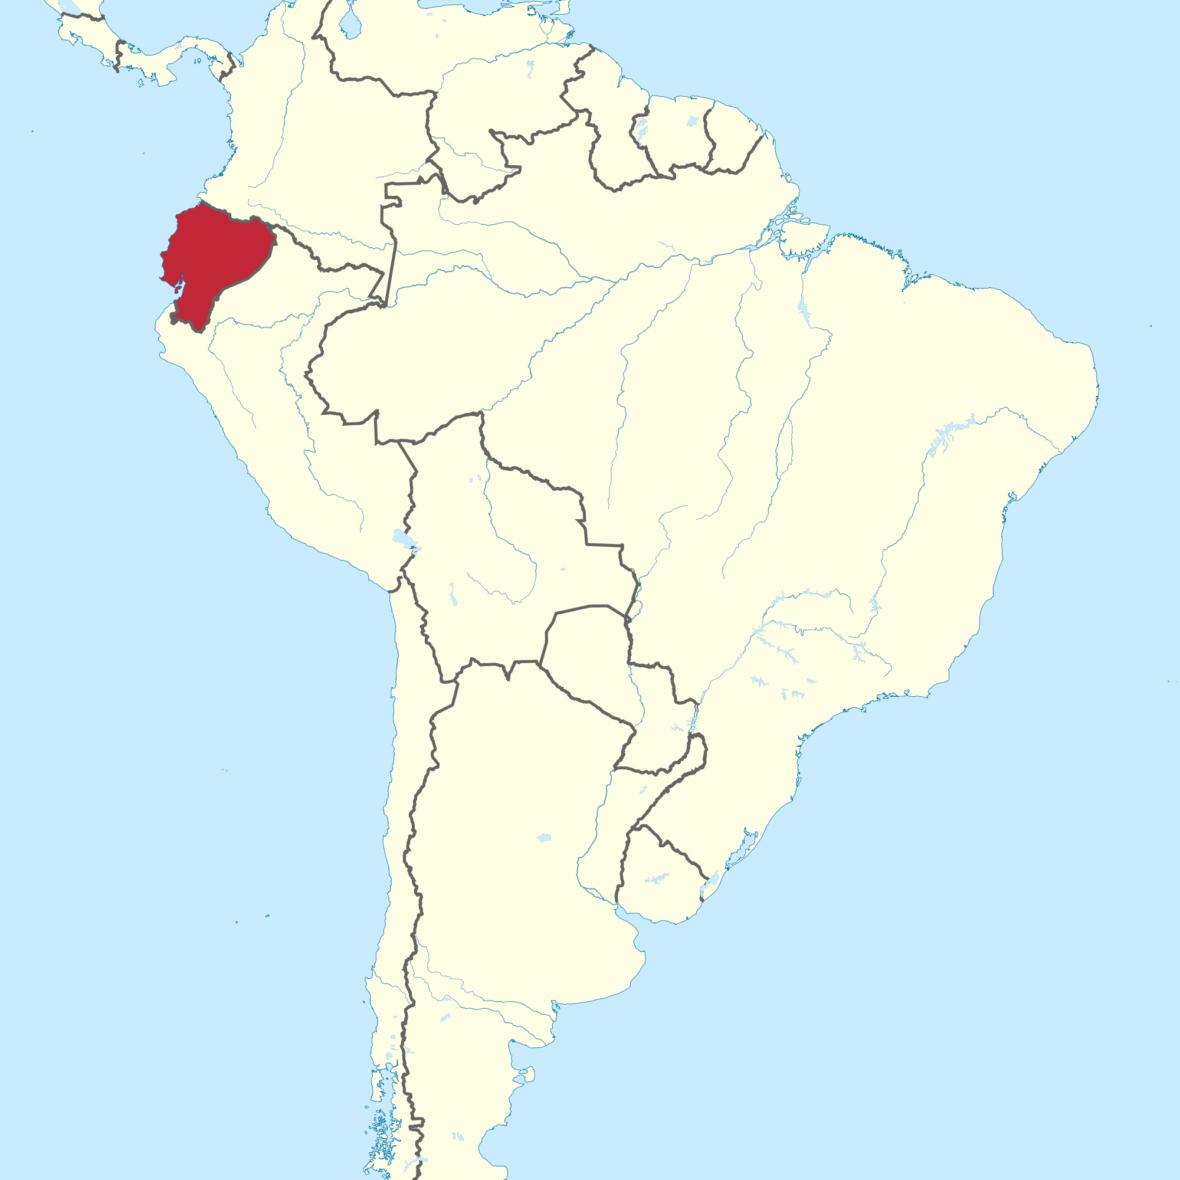 ecuador map | Musiker ohne Grenzen e.V.